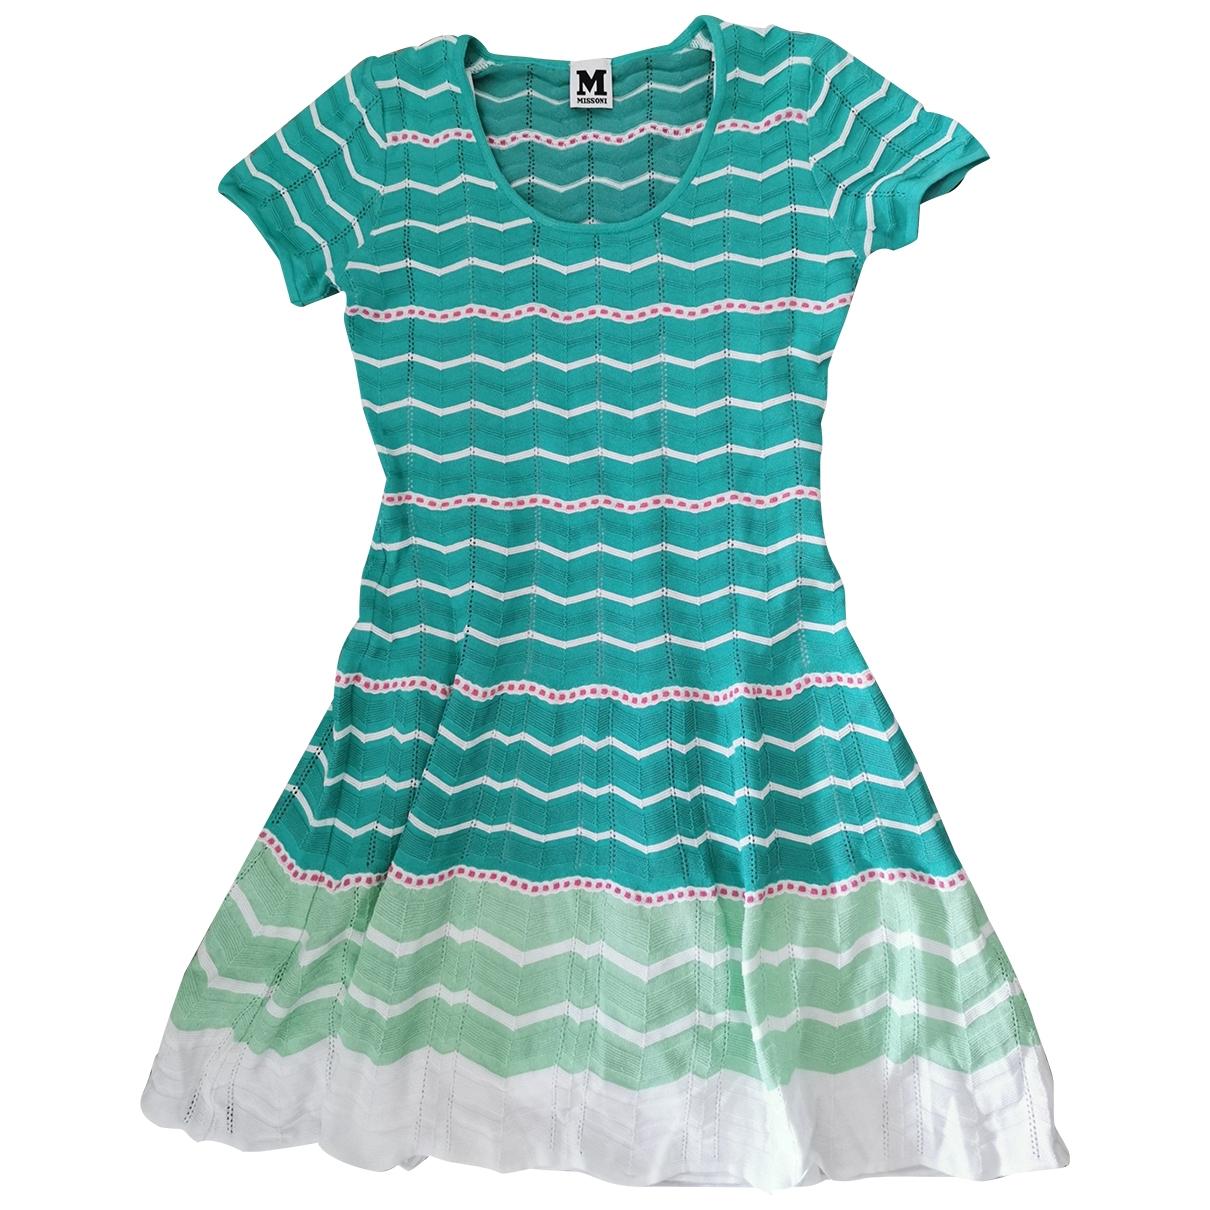 M Missoni \N Green Cotton dress for Women 38 IT